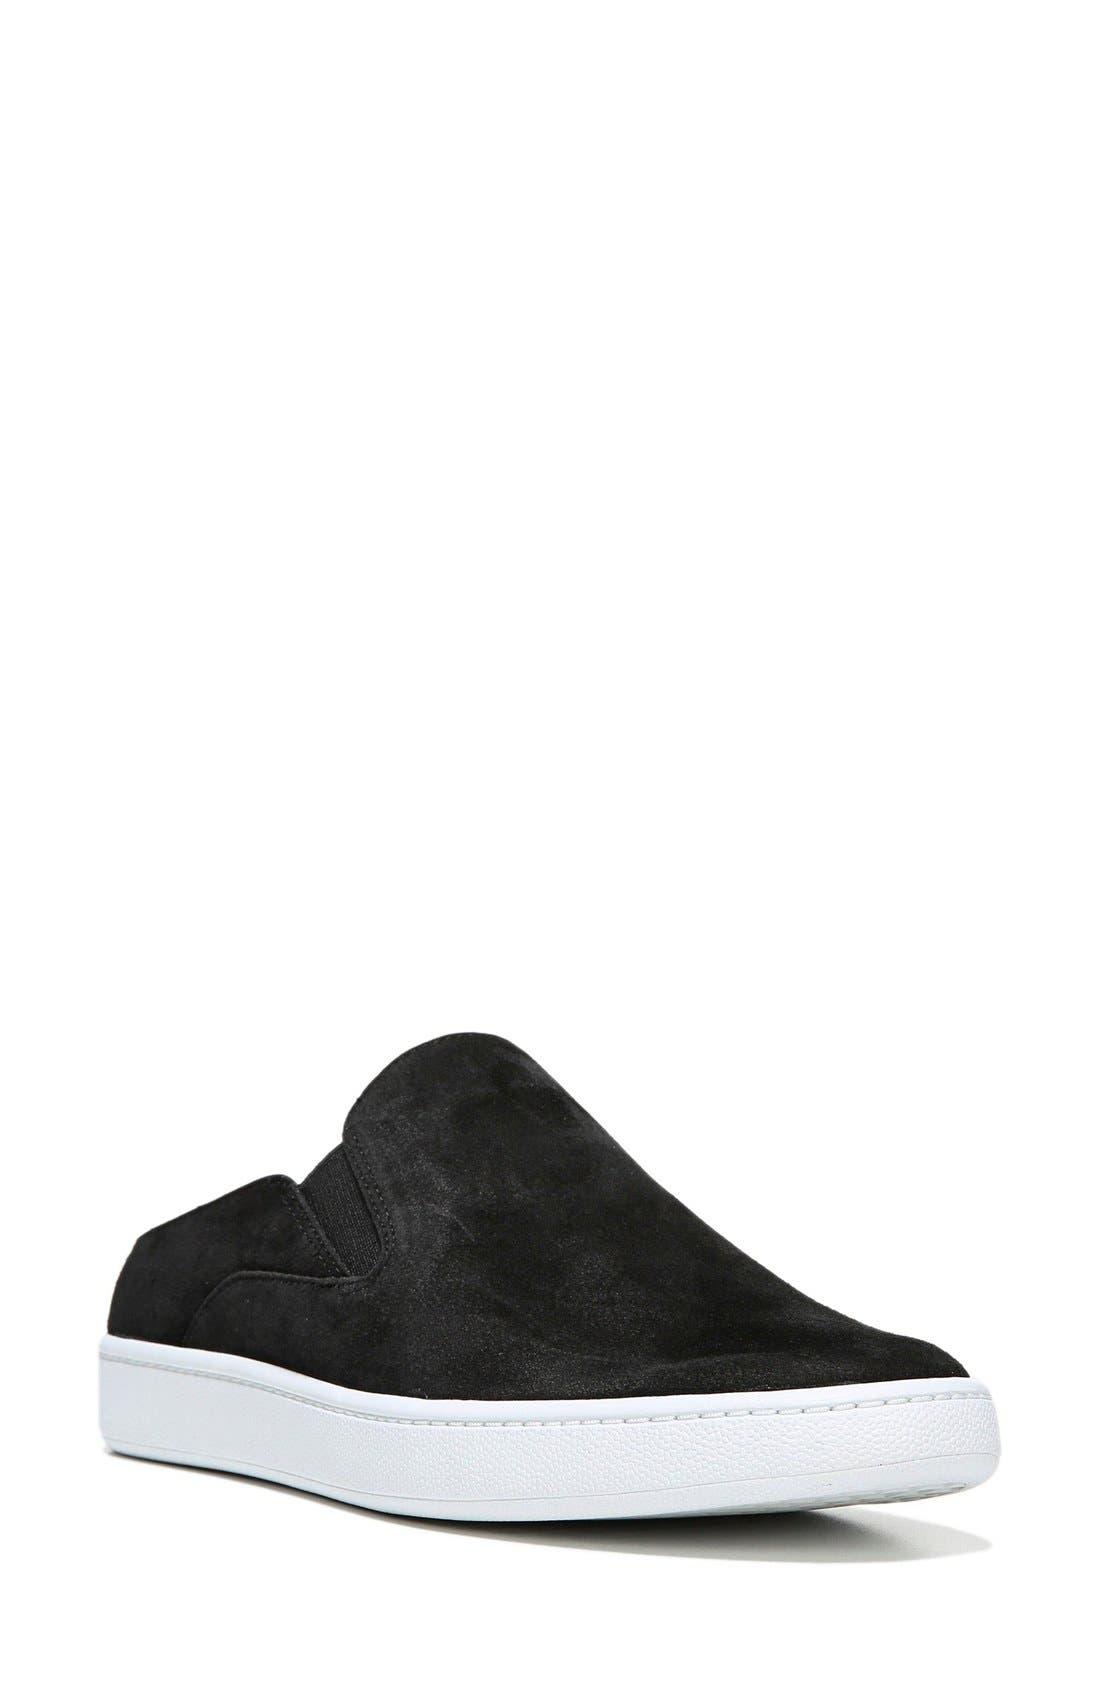 Verrell Slip-On Sneaker,                             Main thumbnail 1, color,                             BLACK SUEDE